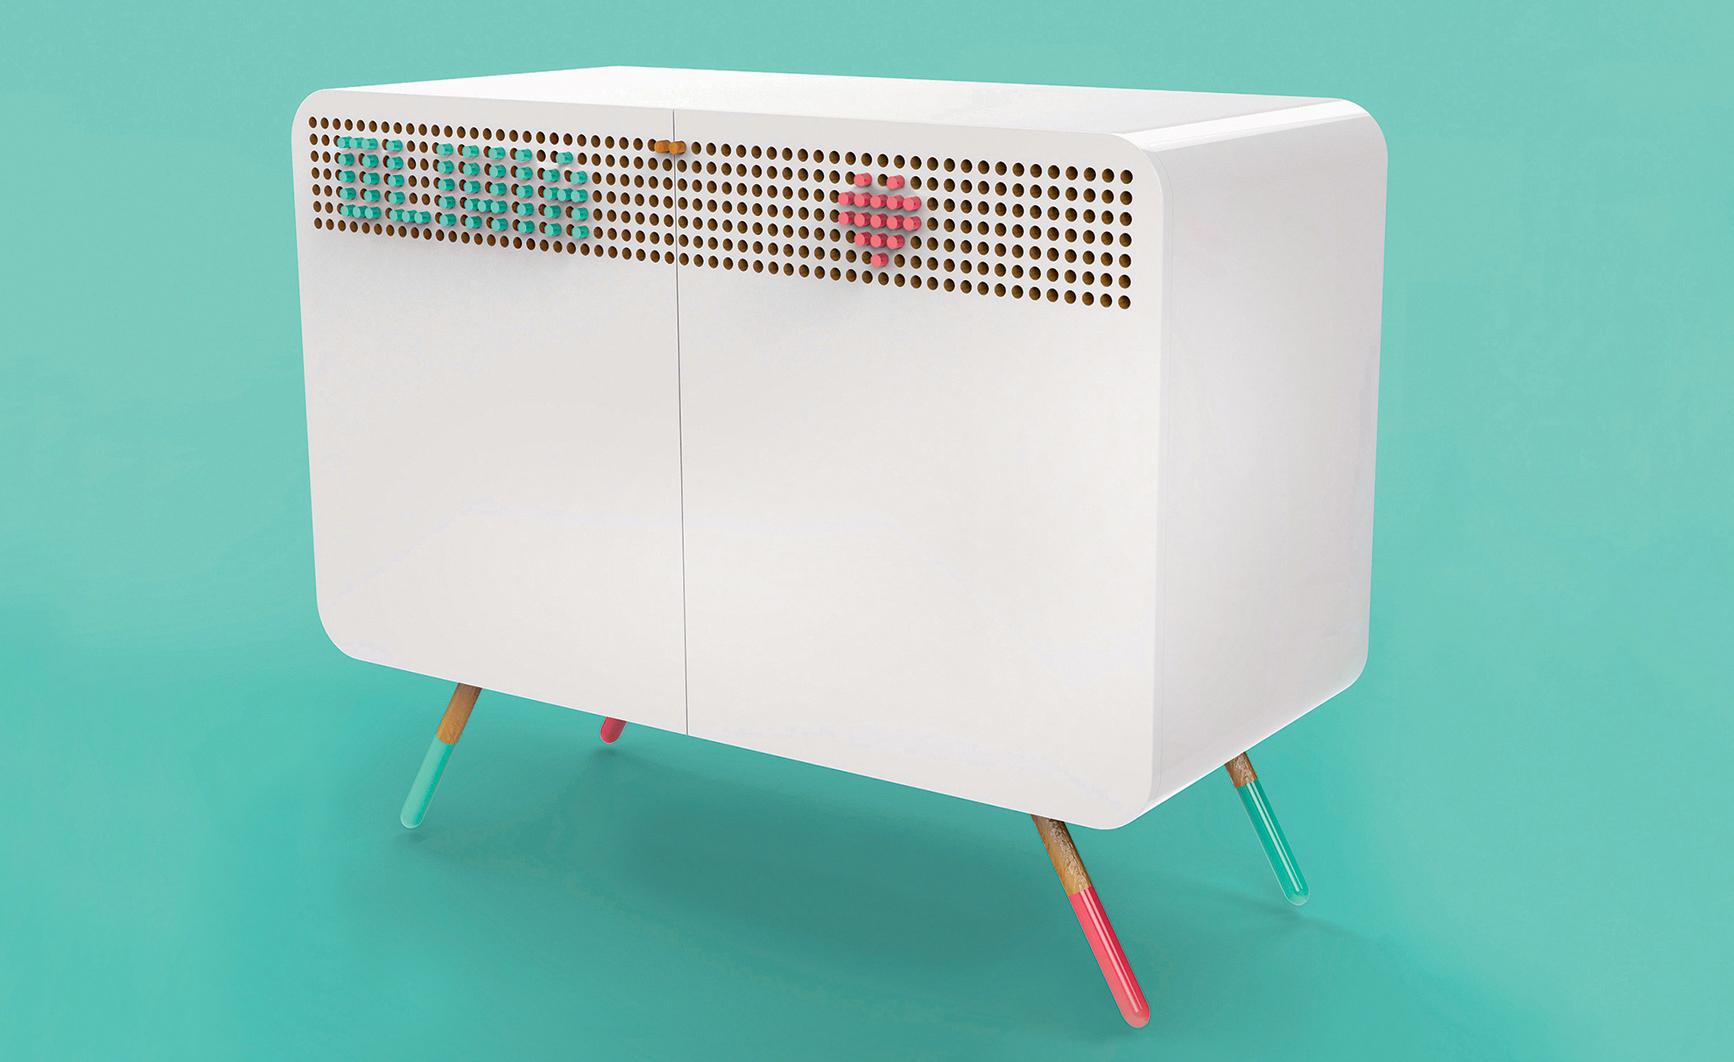 wci-cho-furniture-set-for-children-pawlowska-design-visualization-3